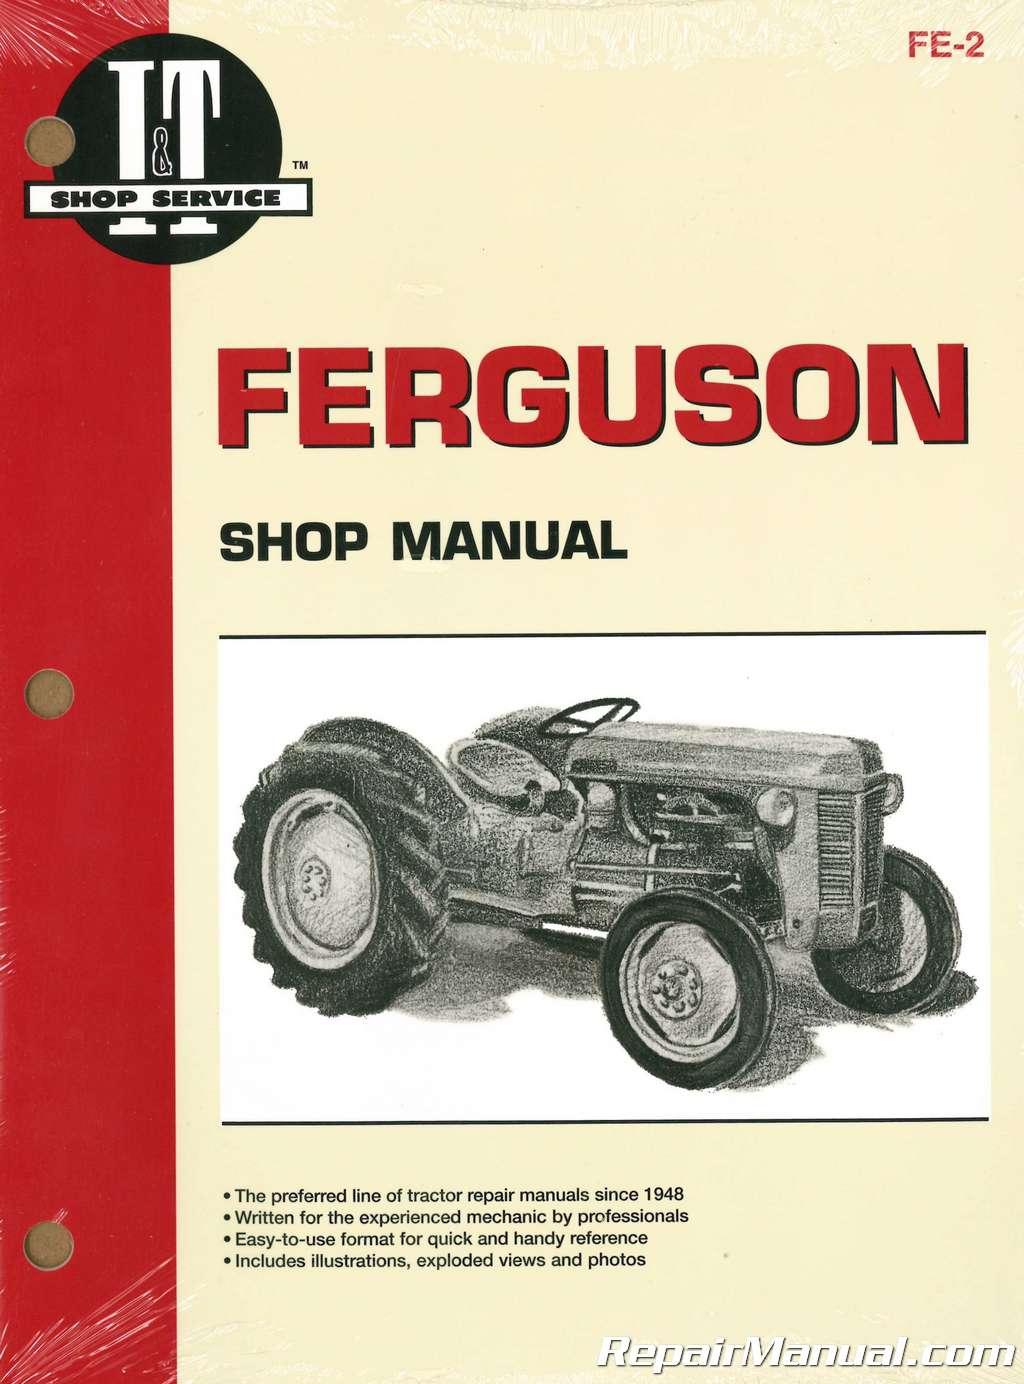 Ferguson 35 Diesel Wiring Diagram On Wiring Diagram For Ferguson T20